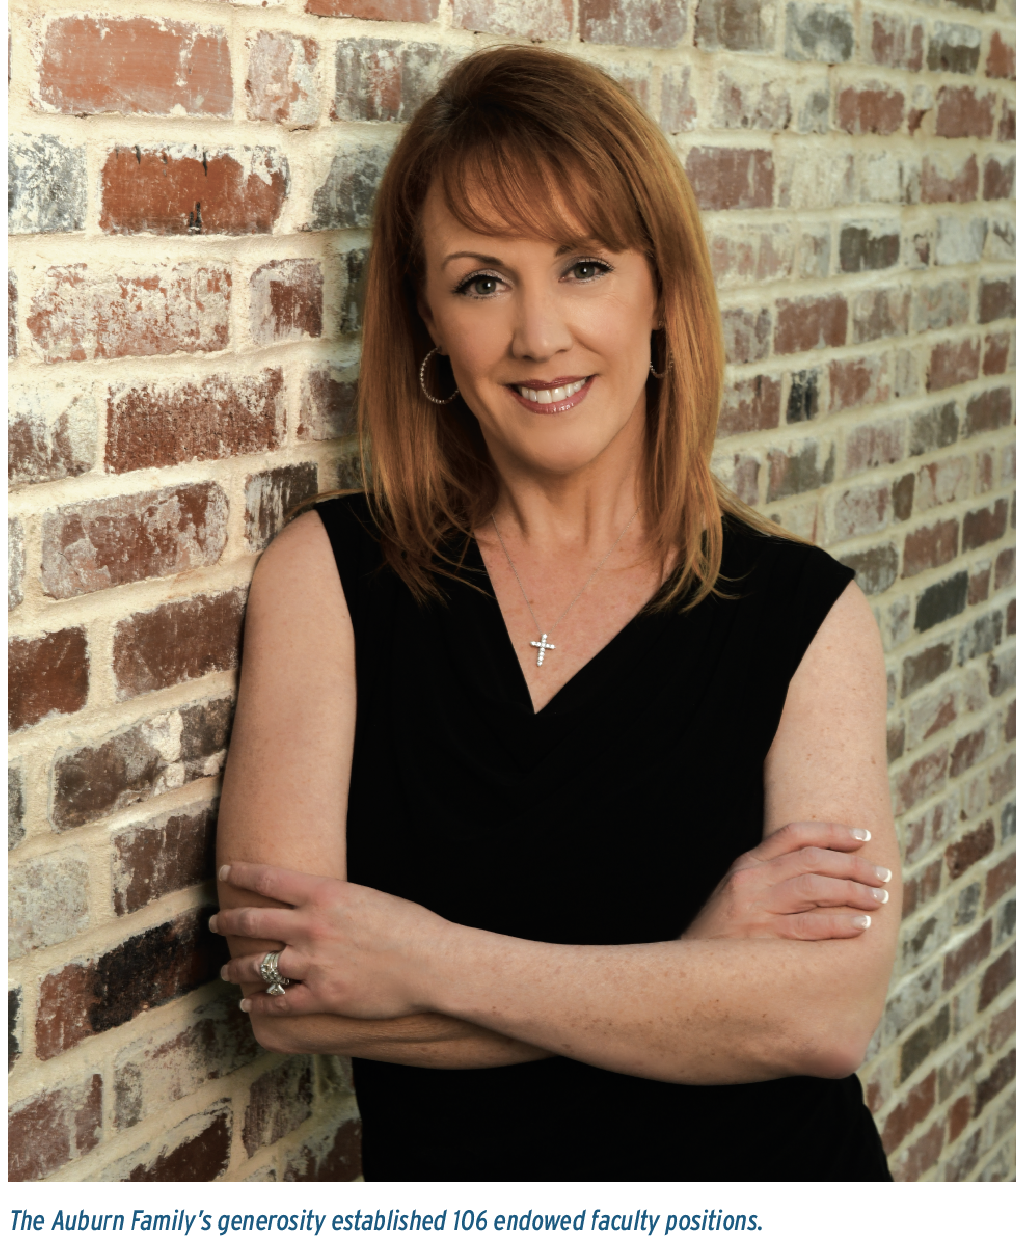 Beth Davis-Sramek; The Auburn Family's generosity established 106 endowed faculty positions.